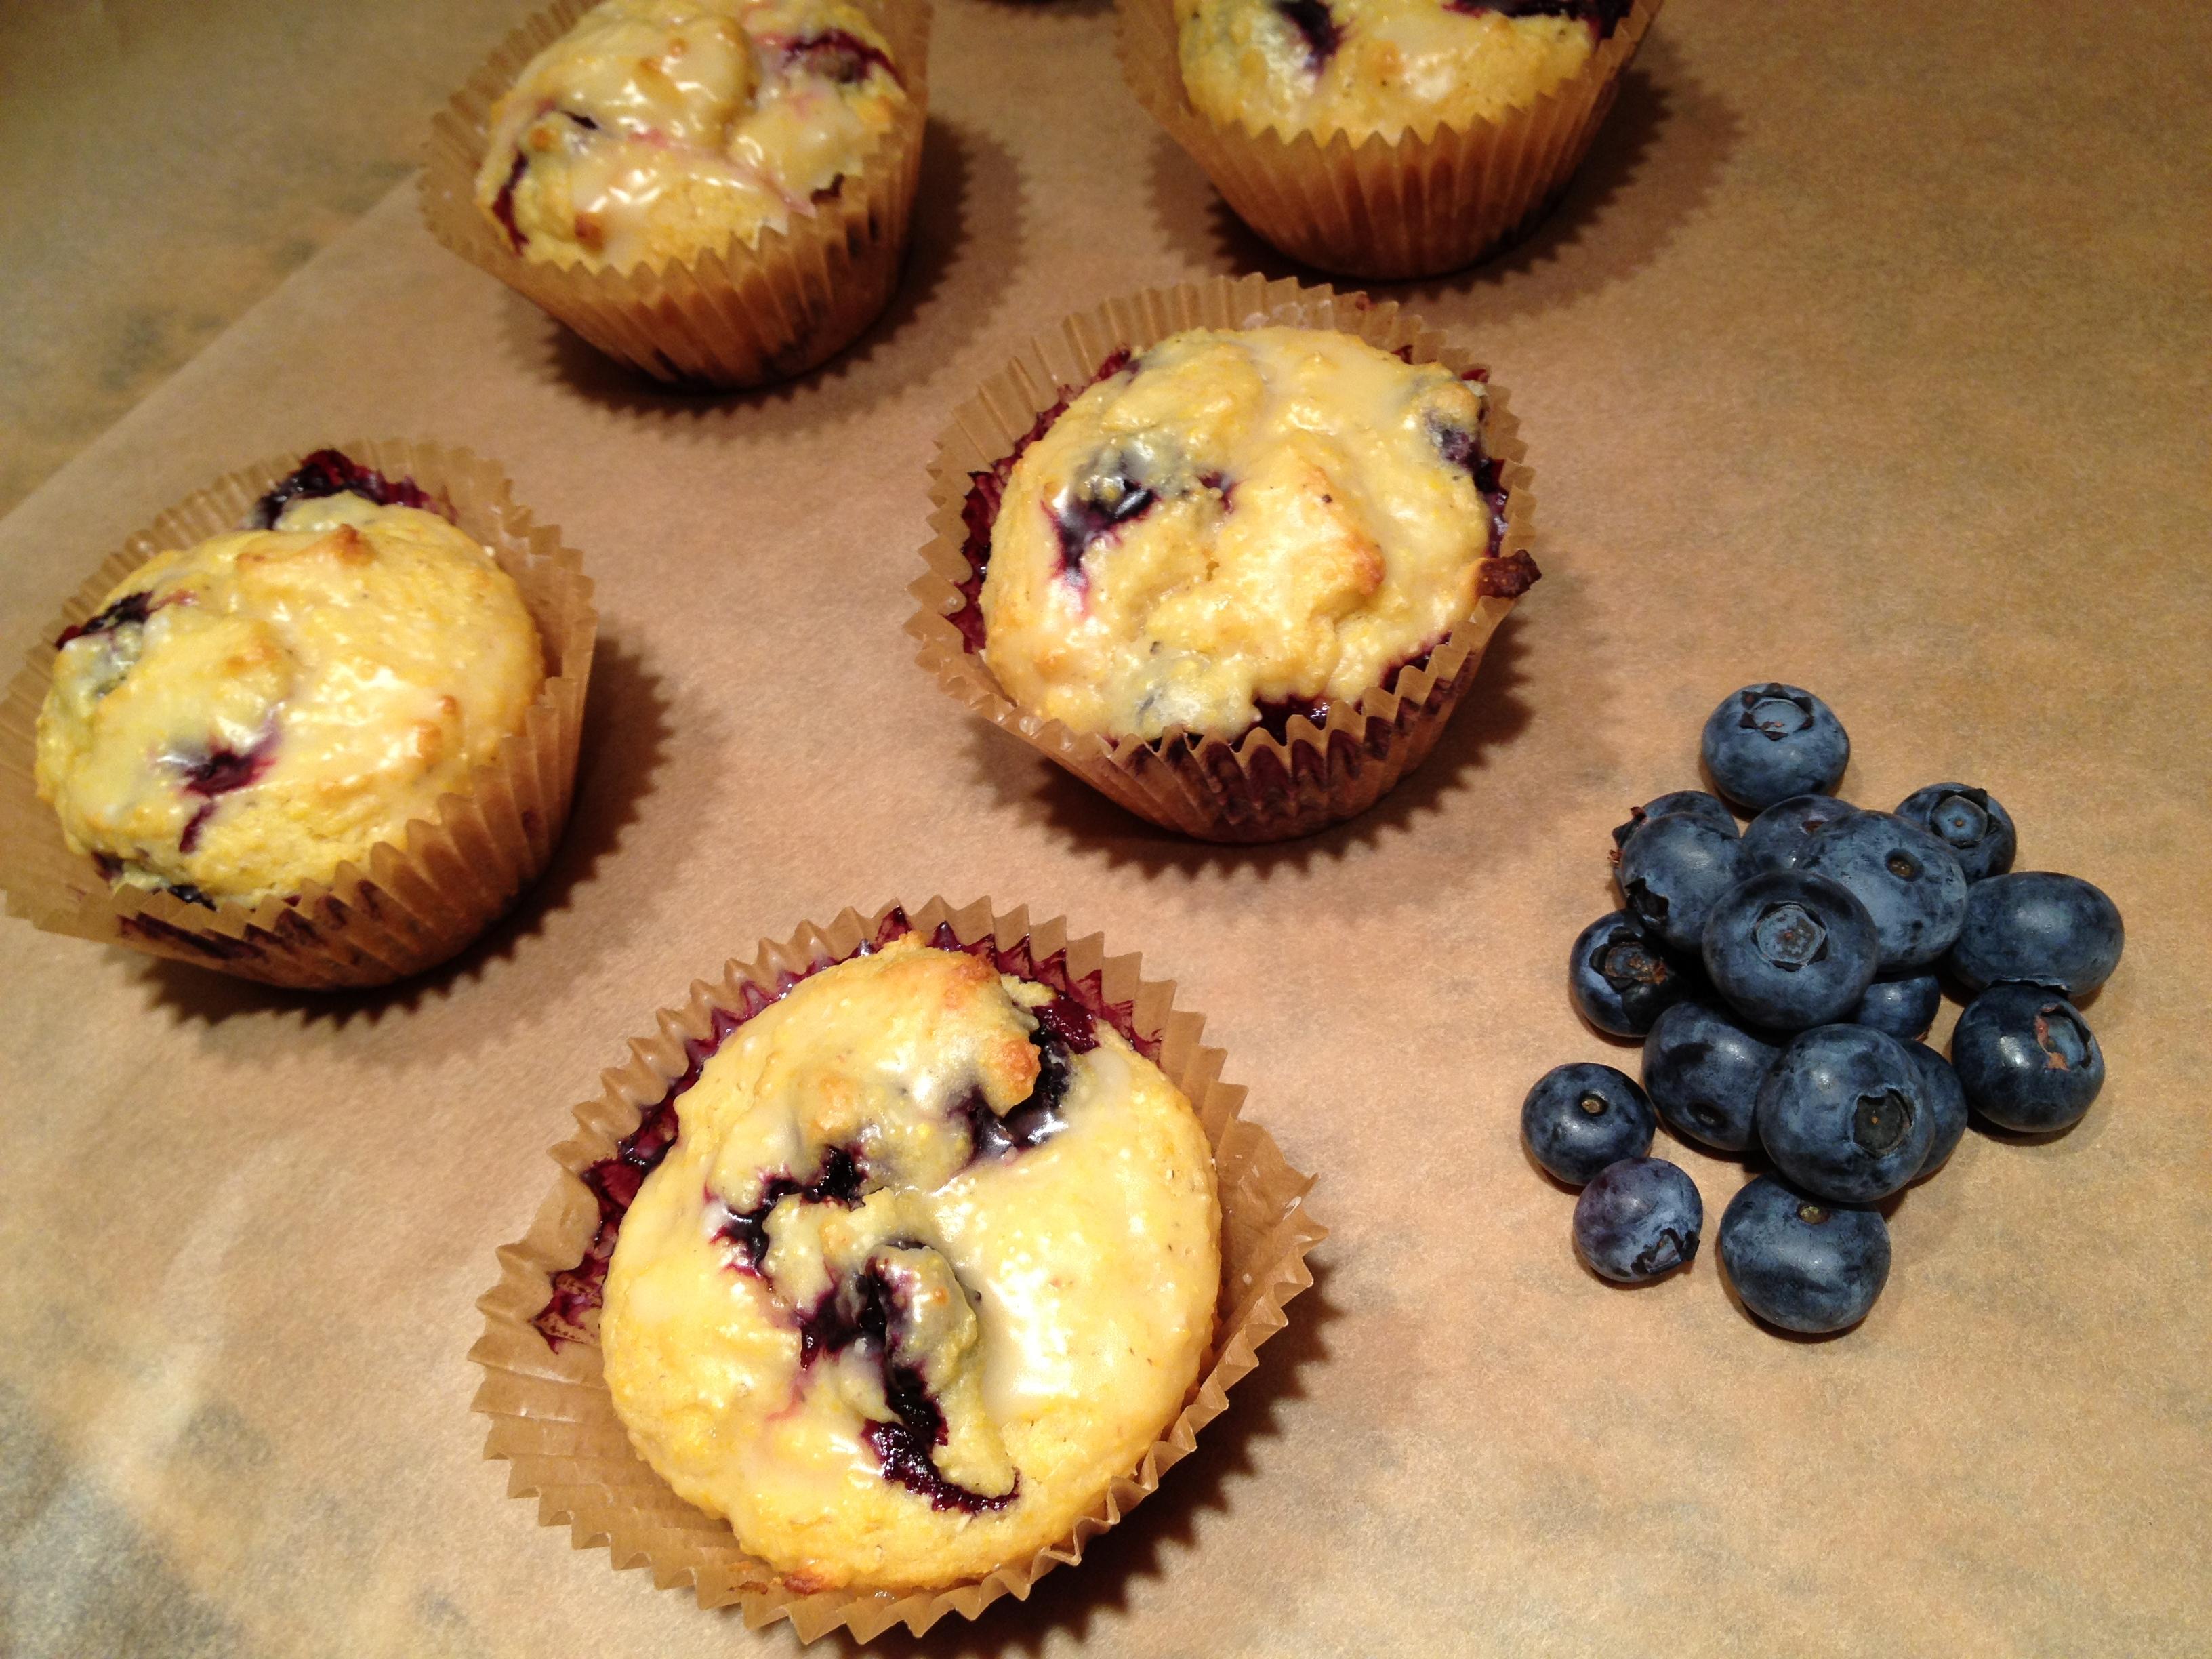 Blueberry + Orange Cornmeal Muffins (my new brunch staple!)